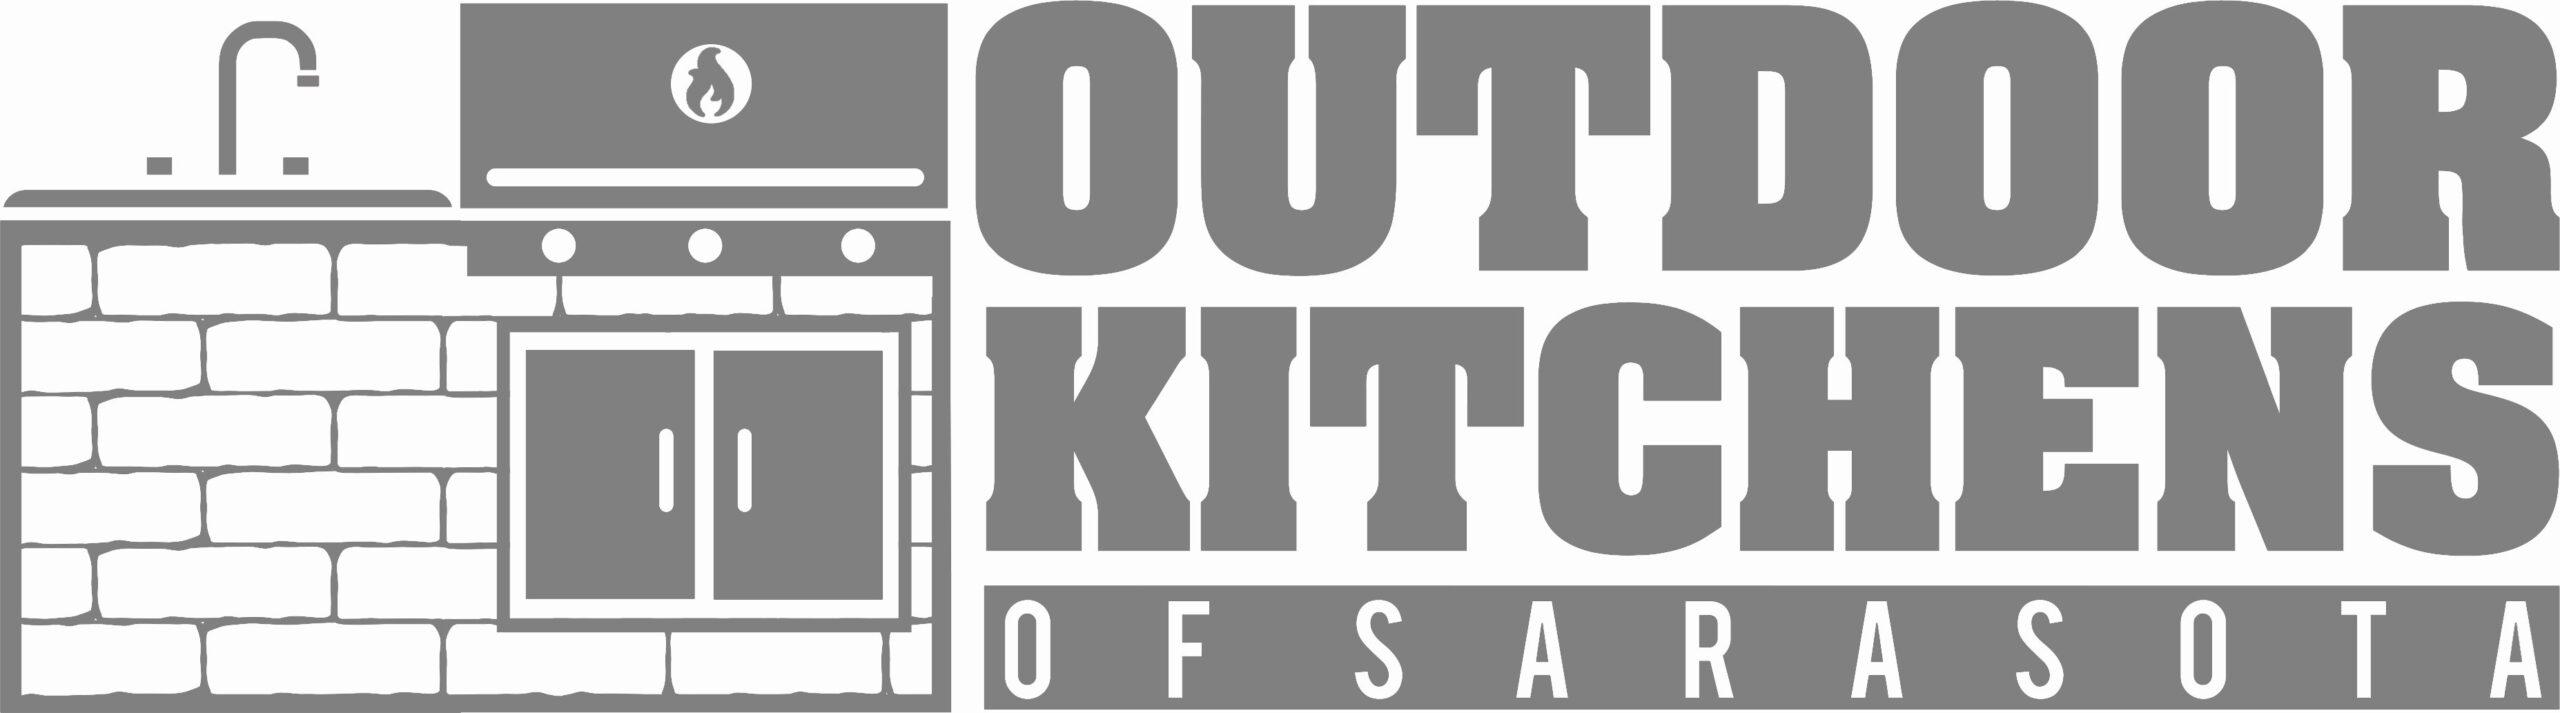 Outdoor Kitchens in Sarasota